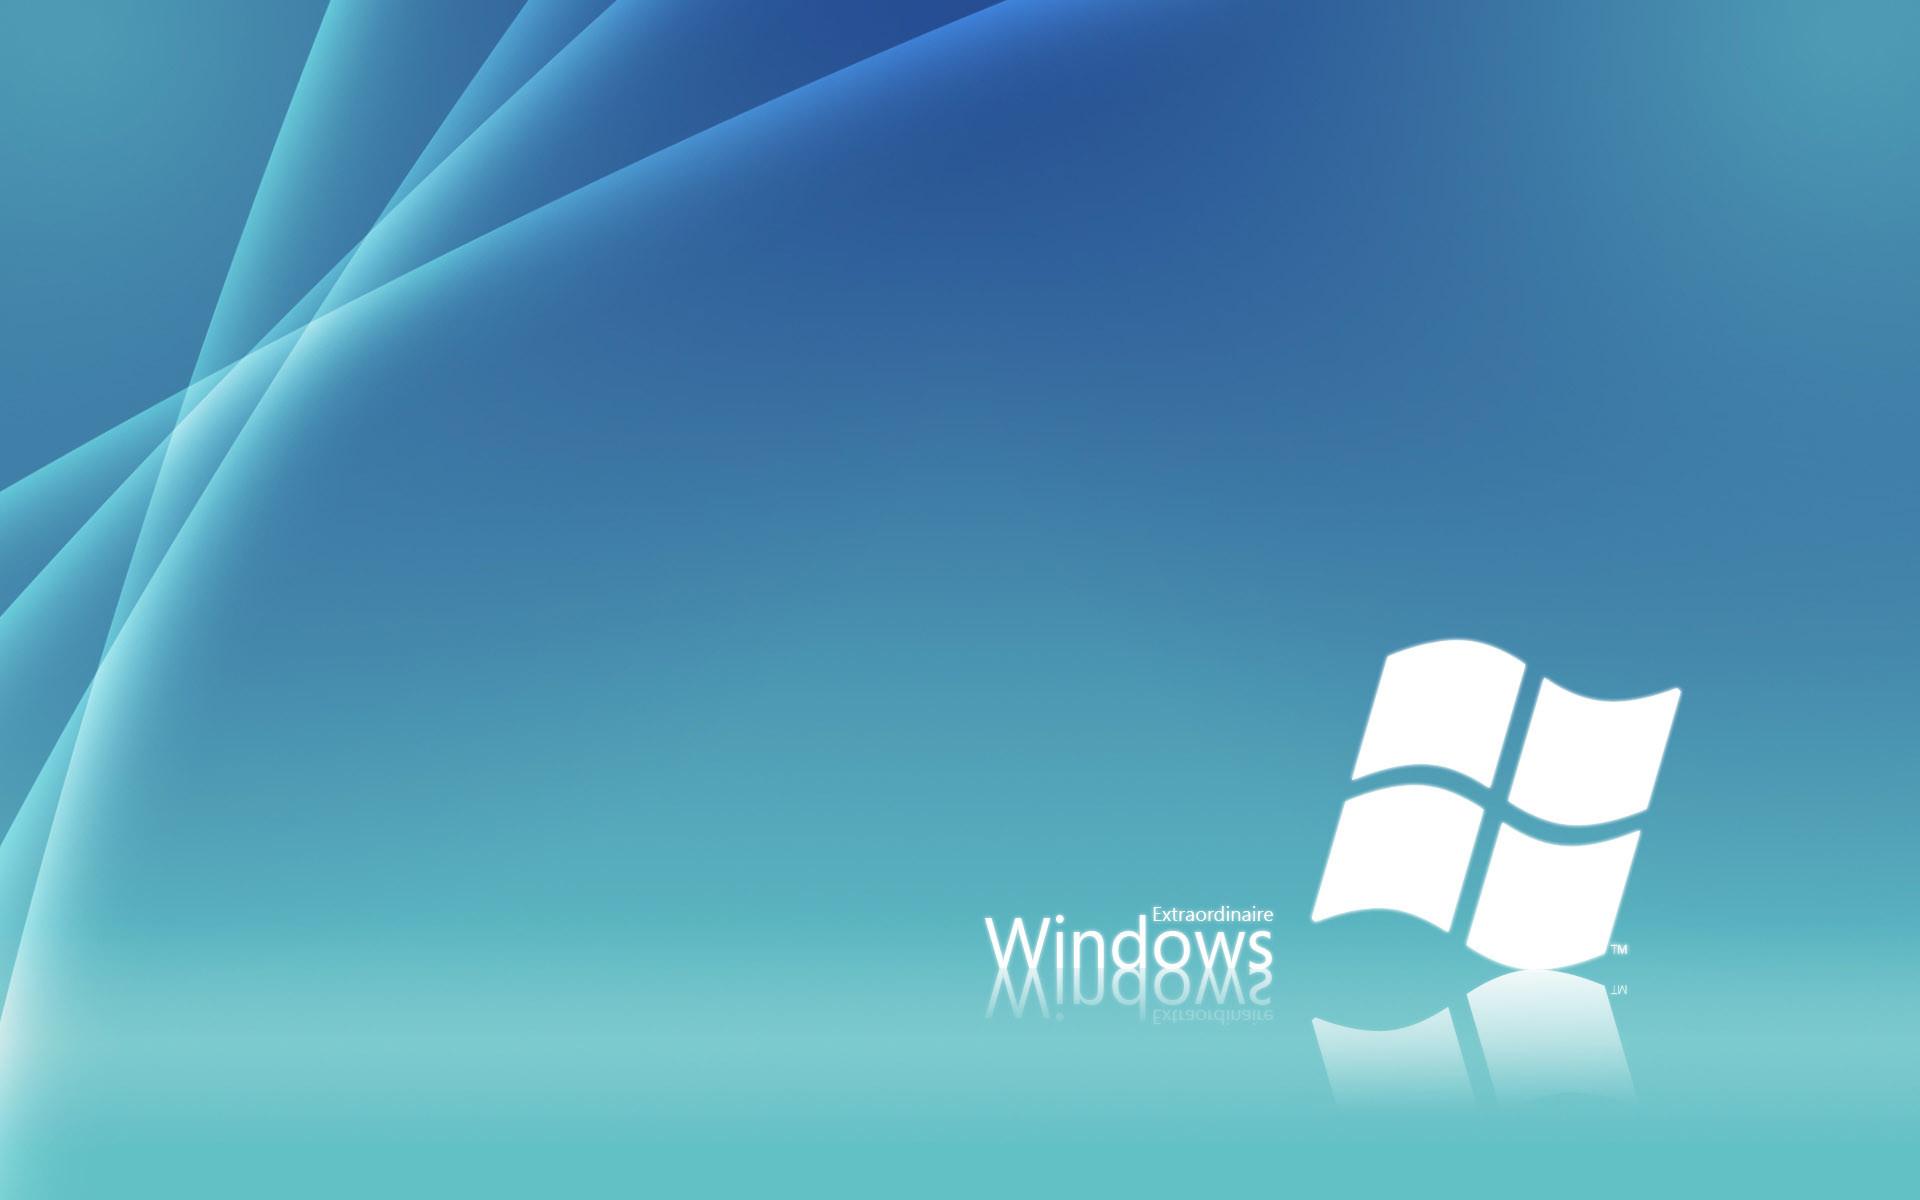 Windows Black Wallpaper Hd High Resolution Wallpaper 1920×1200 High Quality  Wallpapers For Windows 7